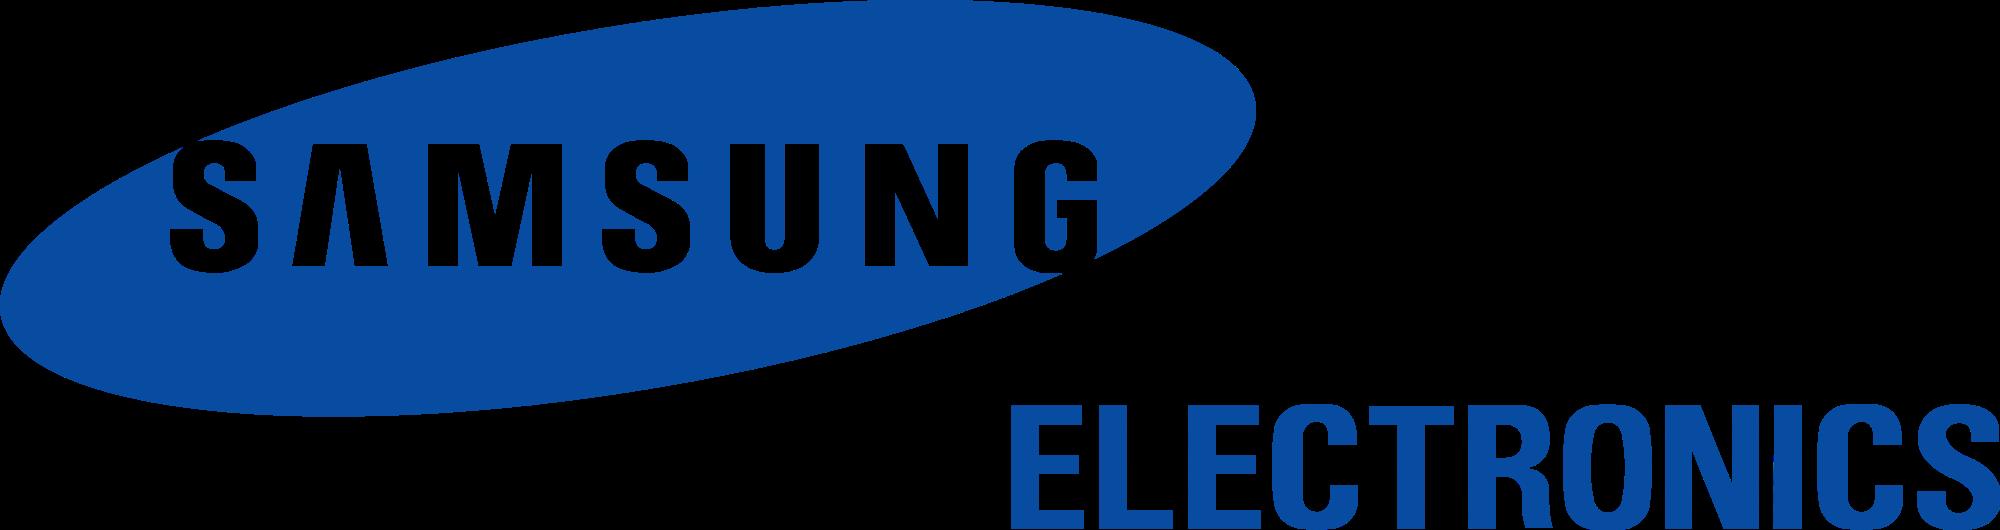 Samsung логотип PNG